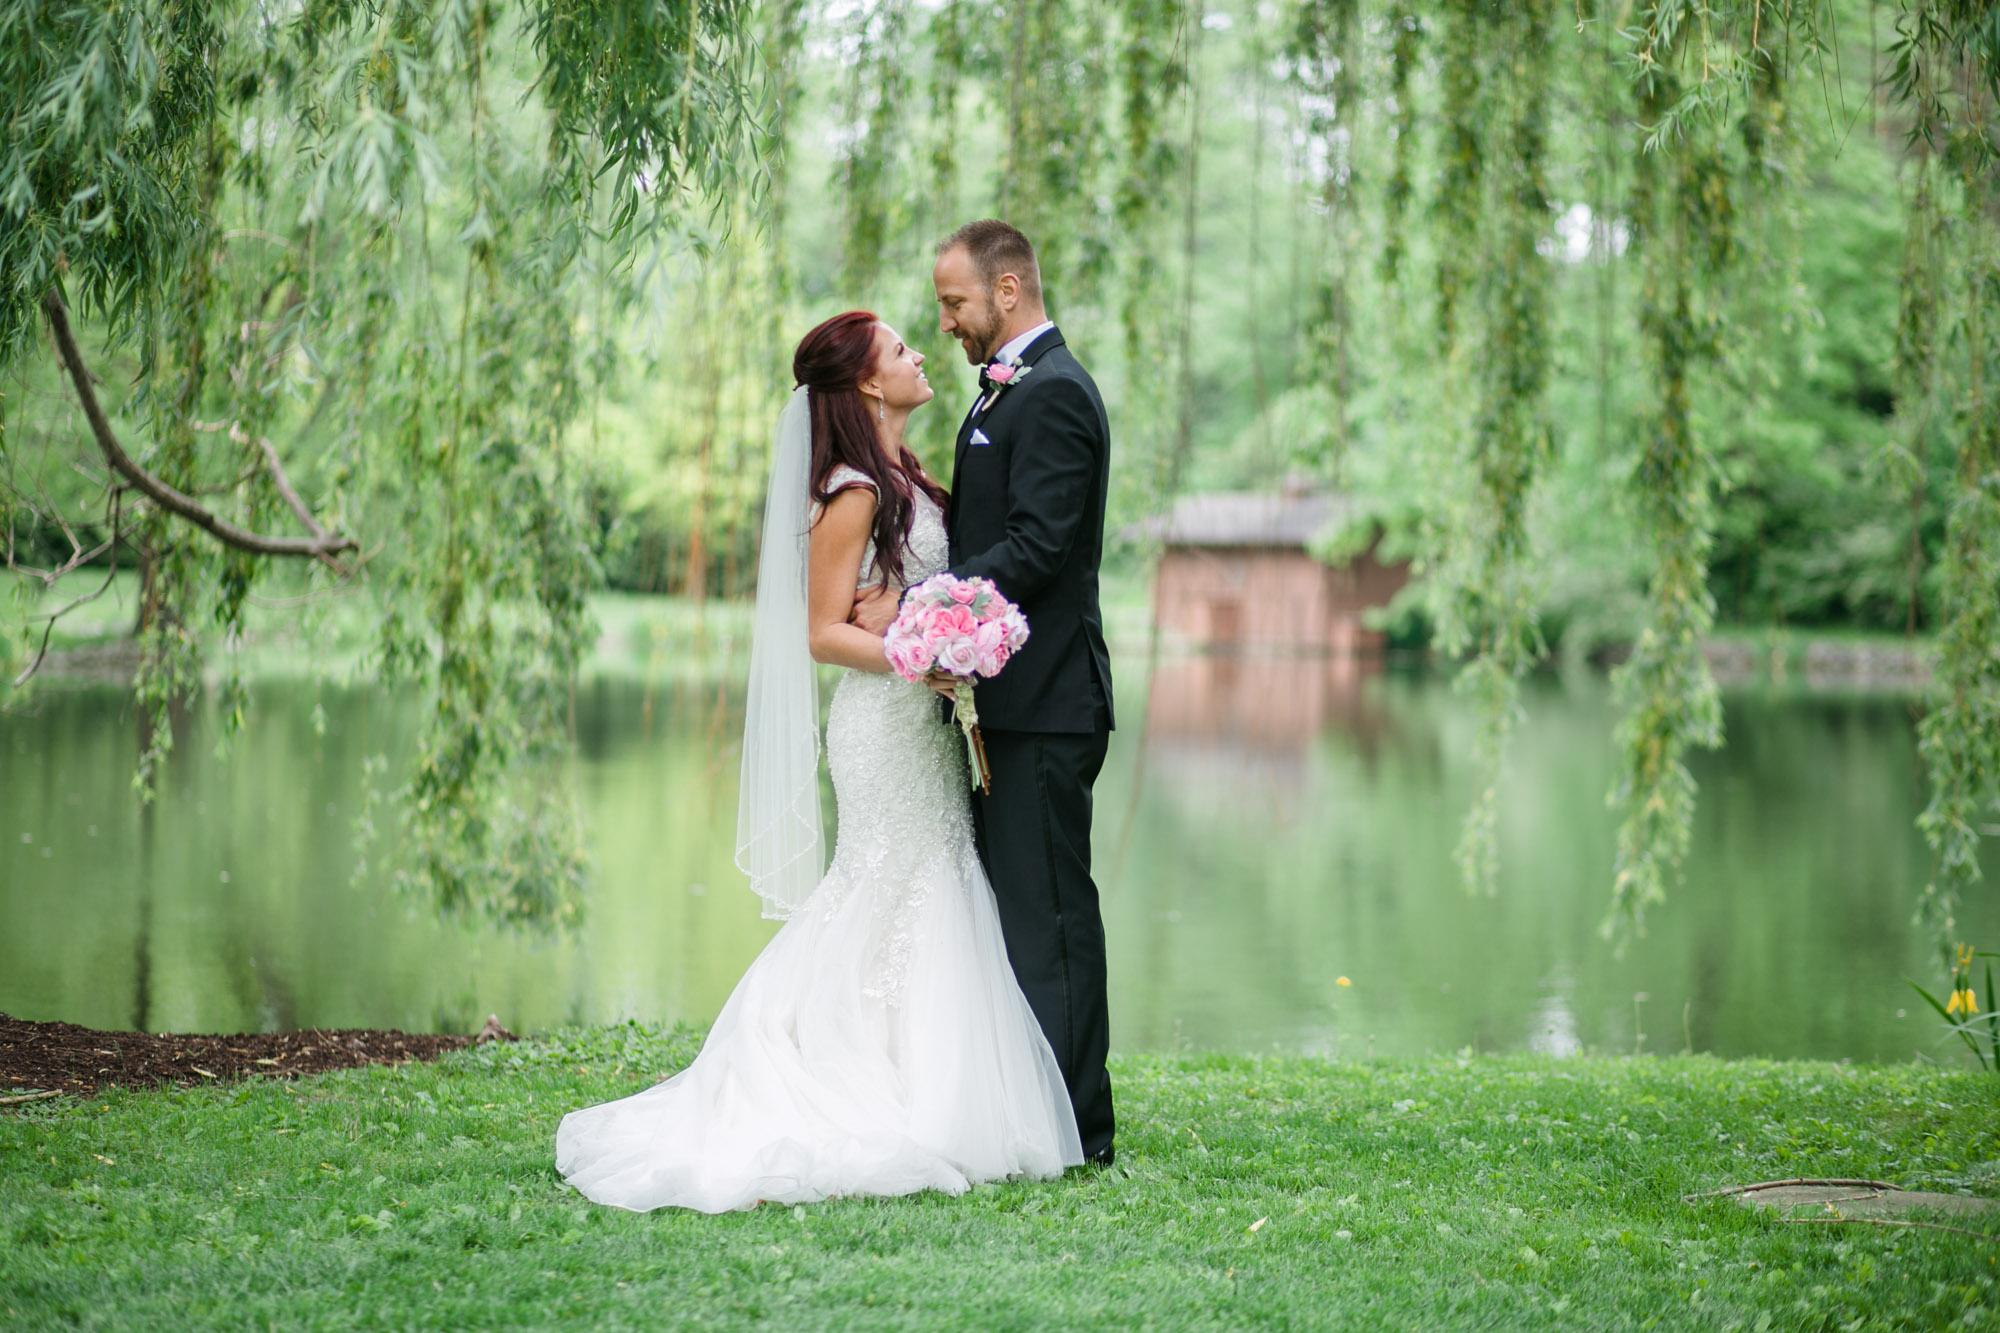 hensville-wedding-downtown-toledo-ohio (55 of 103).jpg